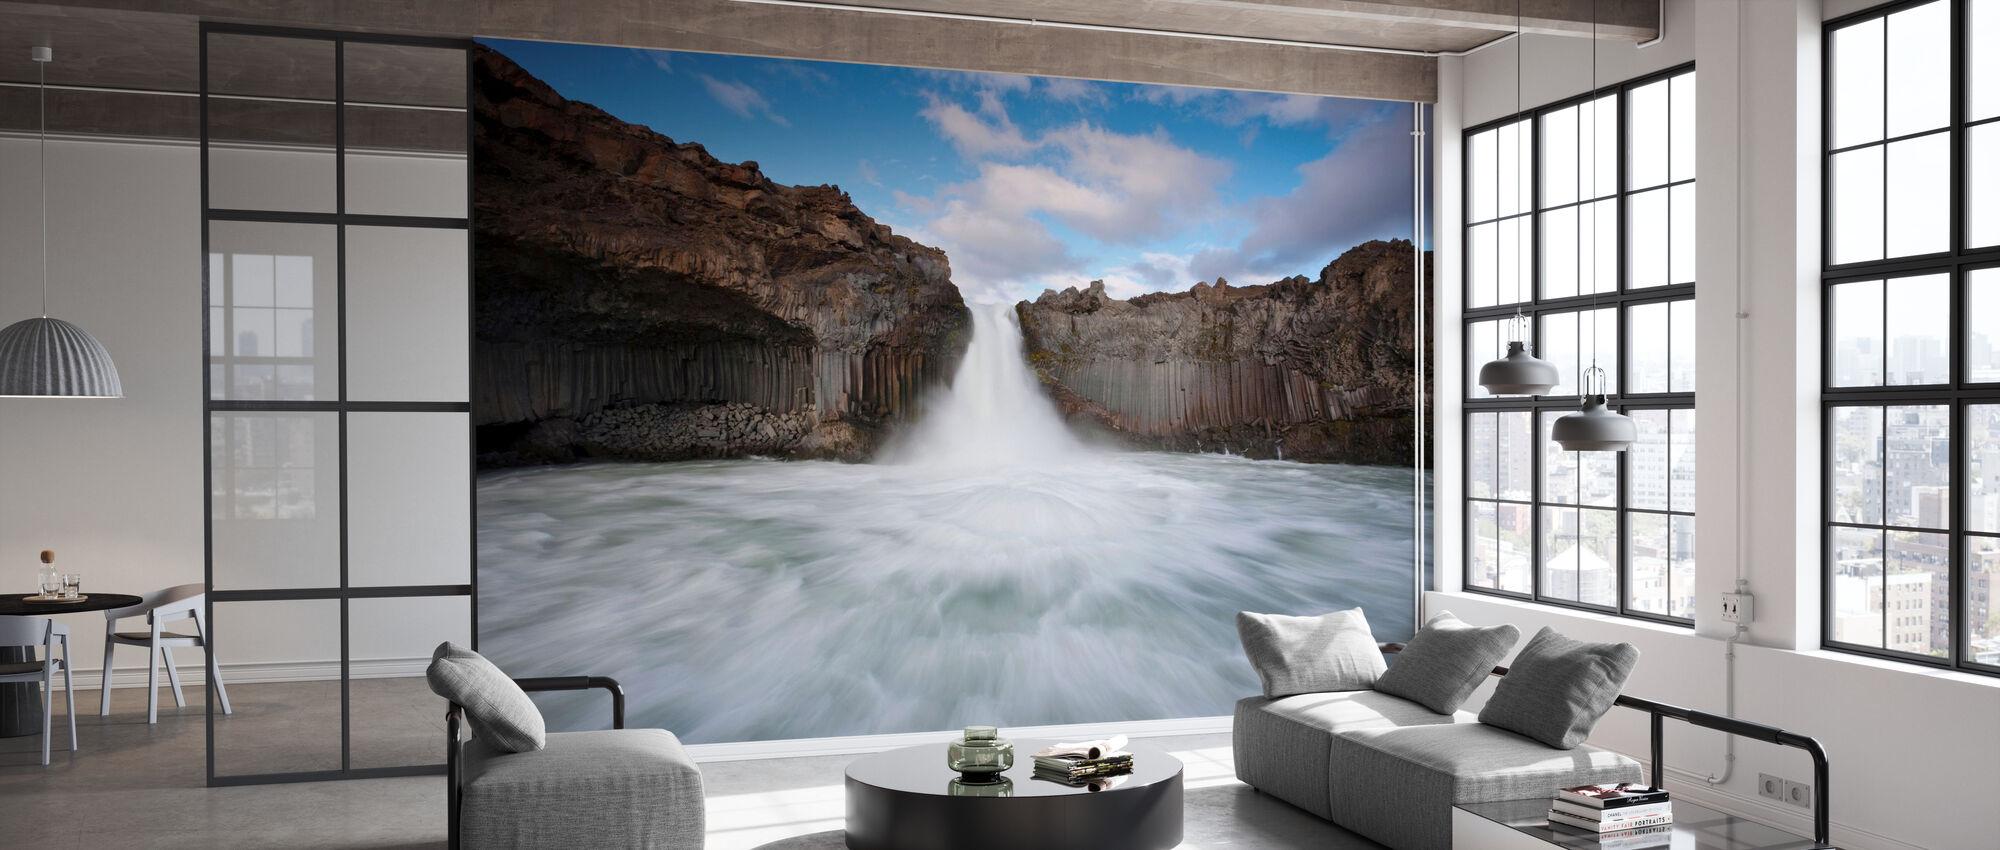 Wild Water - Wallpaper - Office